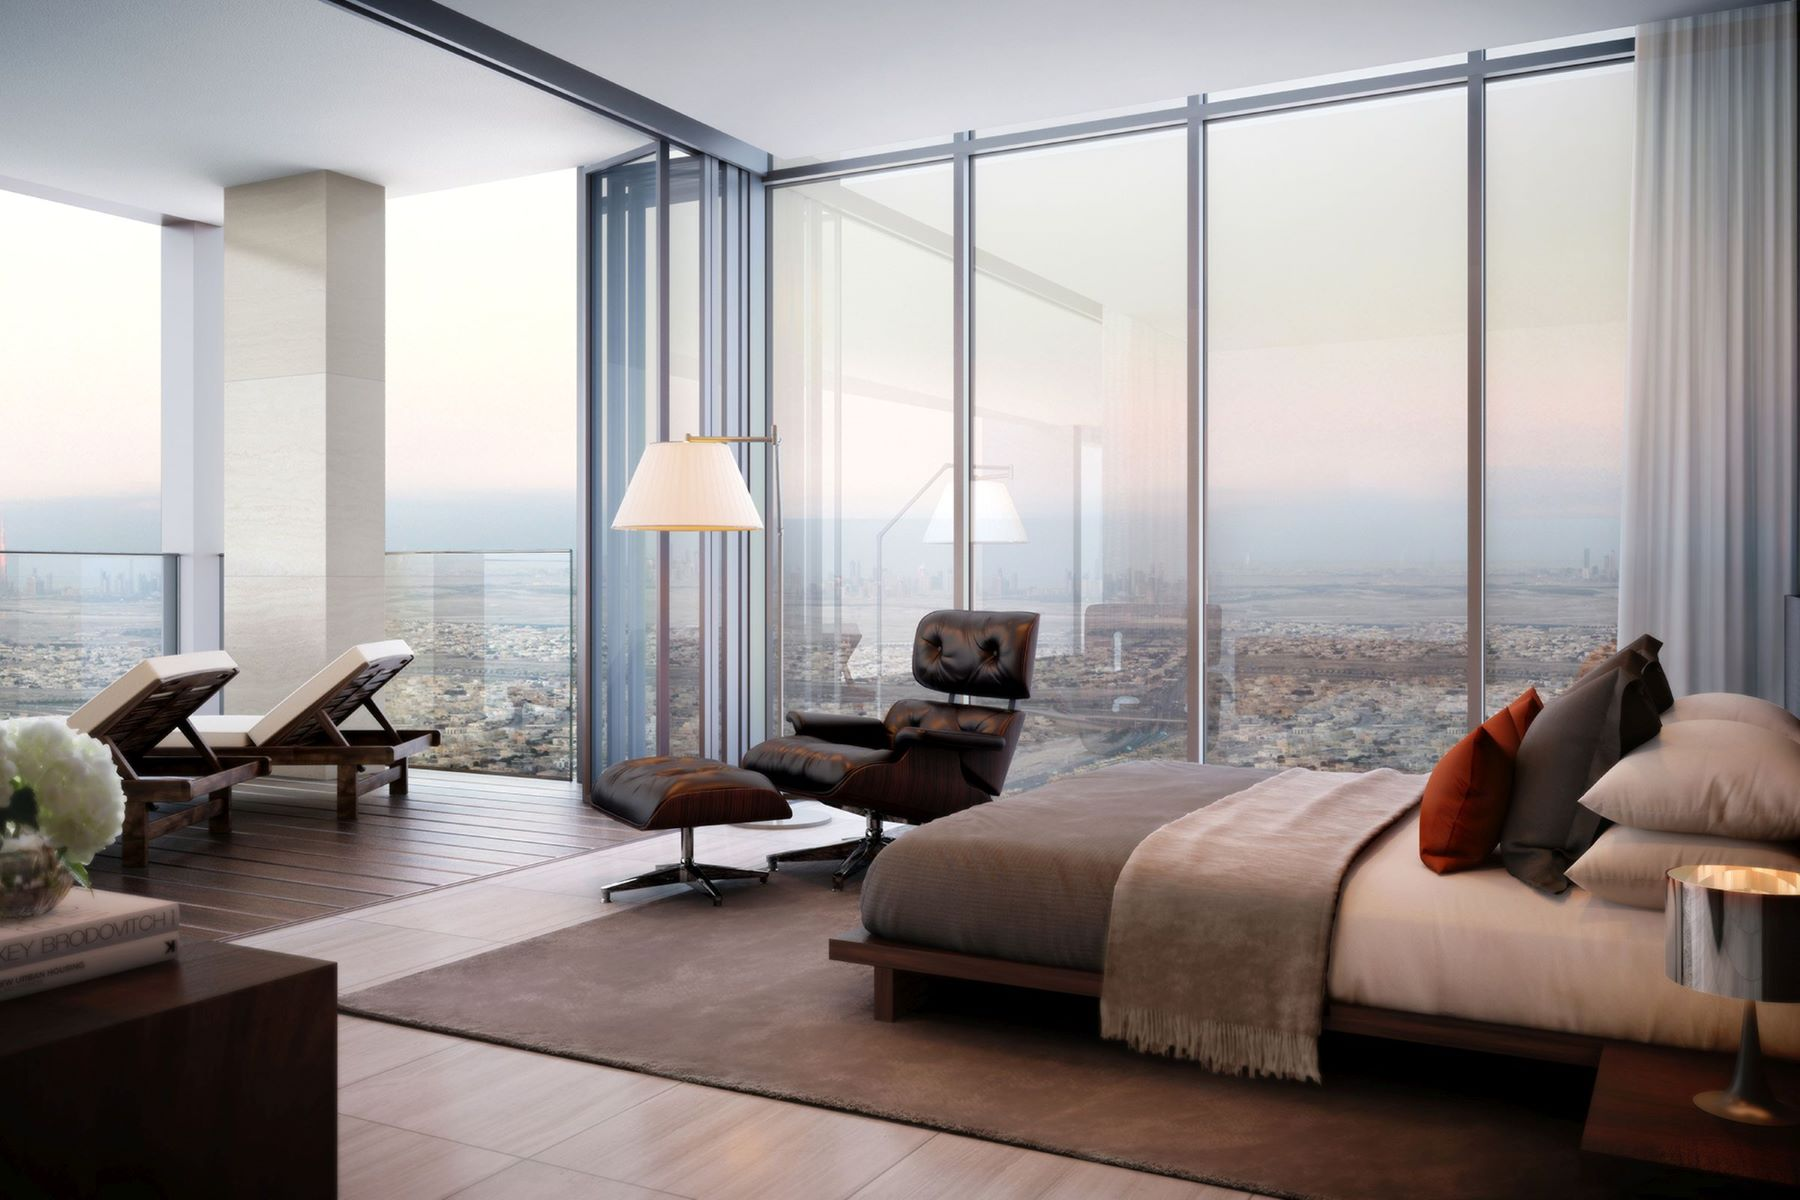 Apartment for Sale at Cayan Cantara by Rotana Dubai, Dubai United Arab Emirates